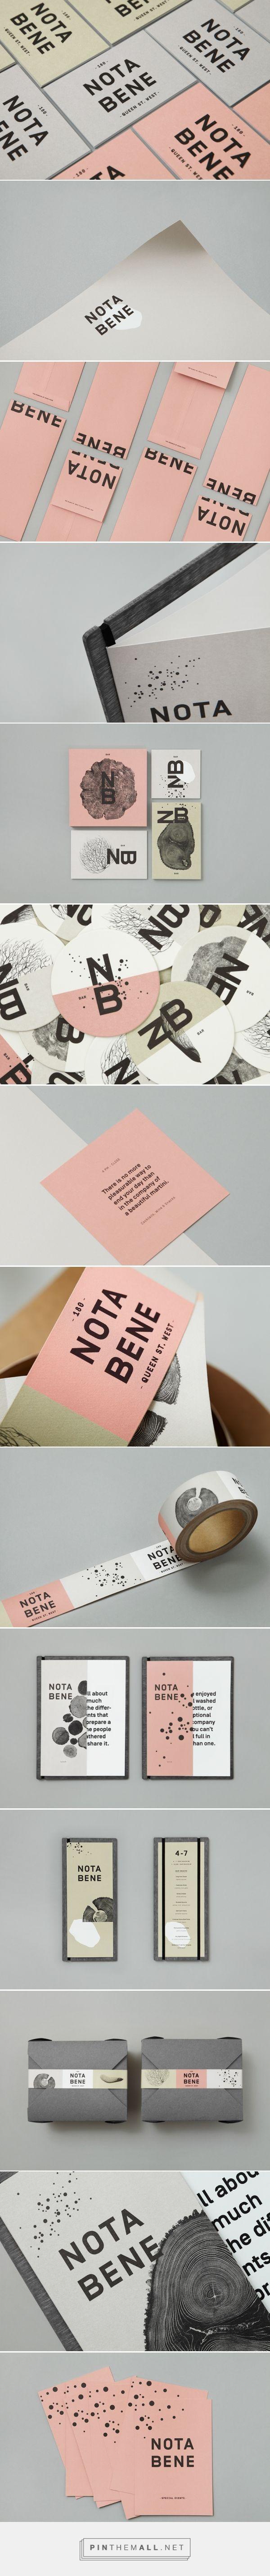 Nota Bene by Blok Design